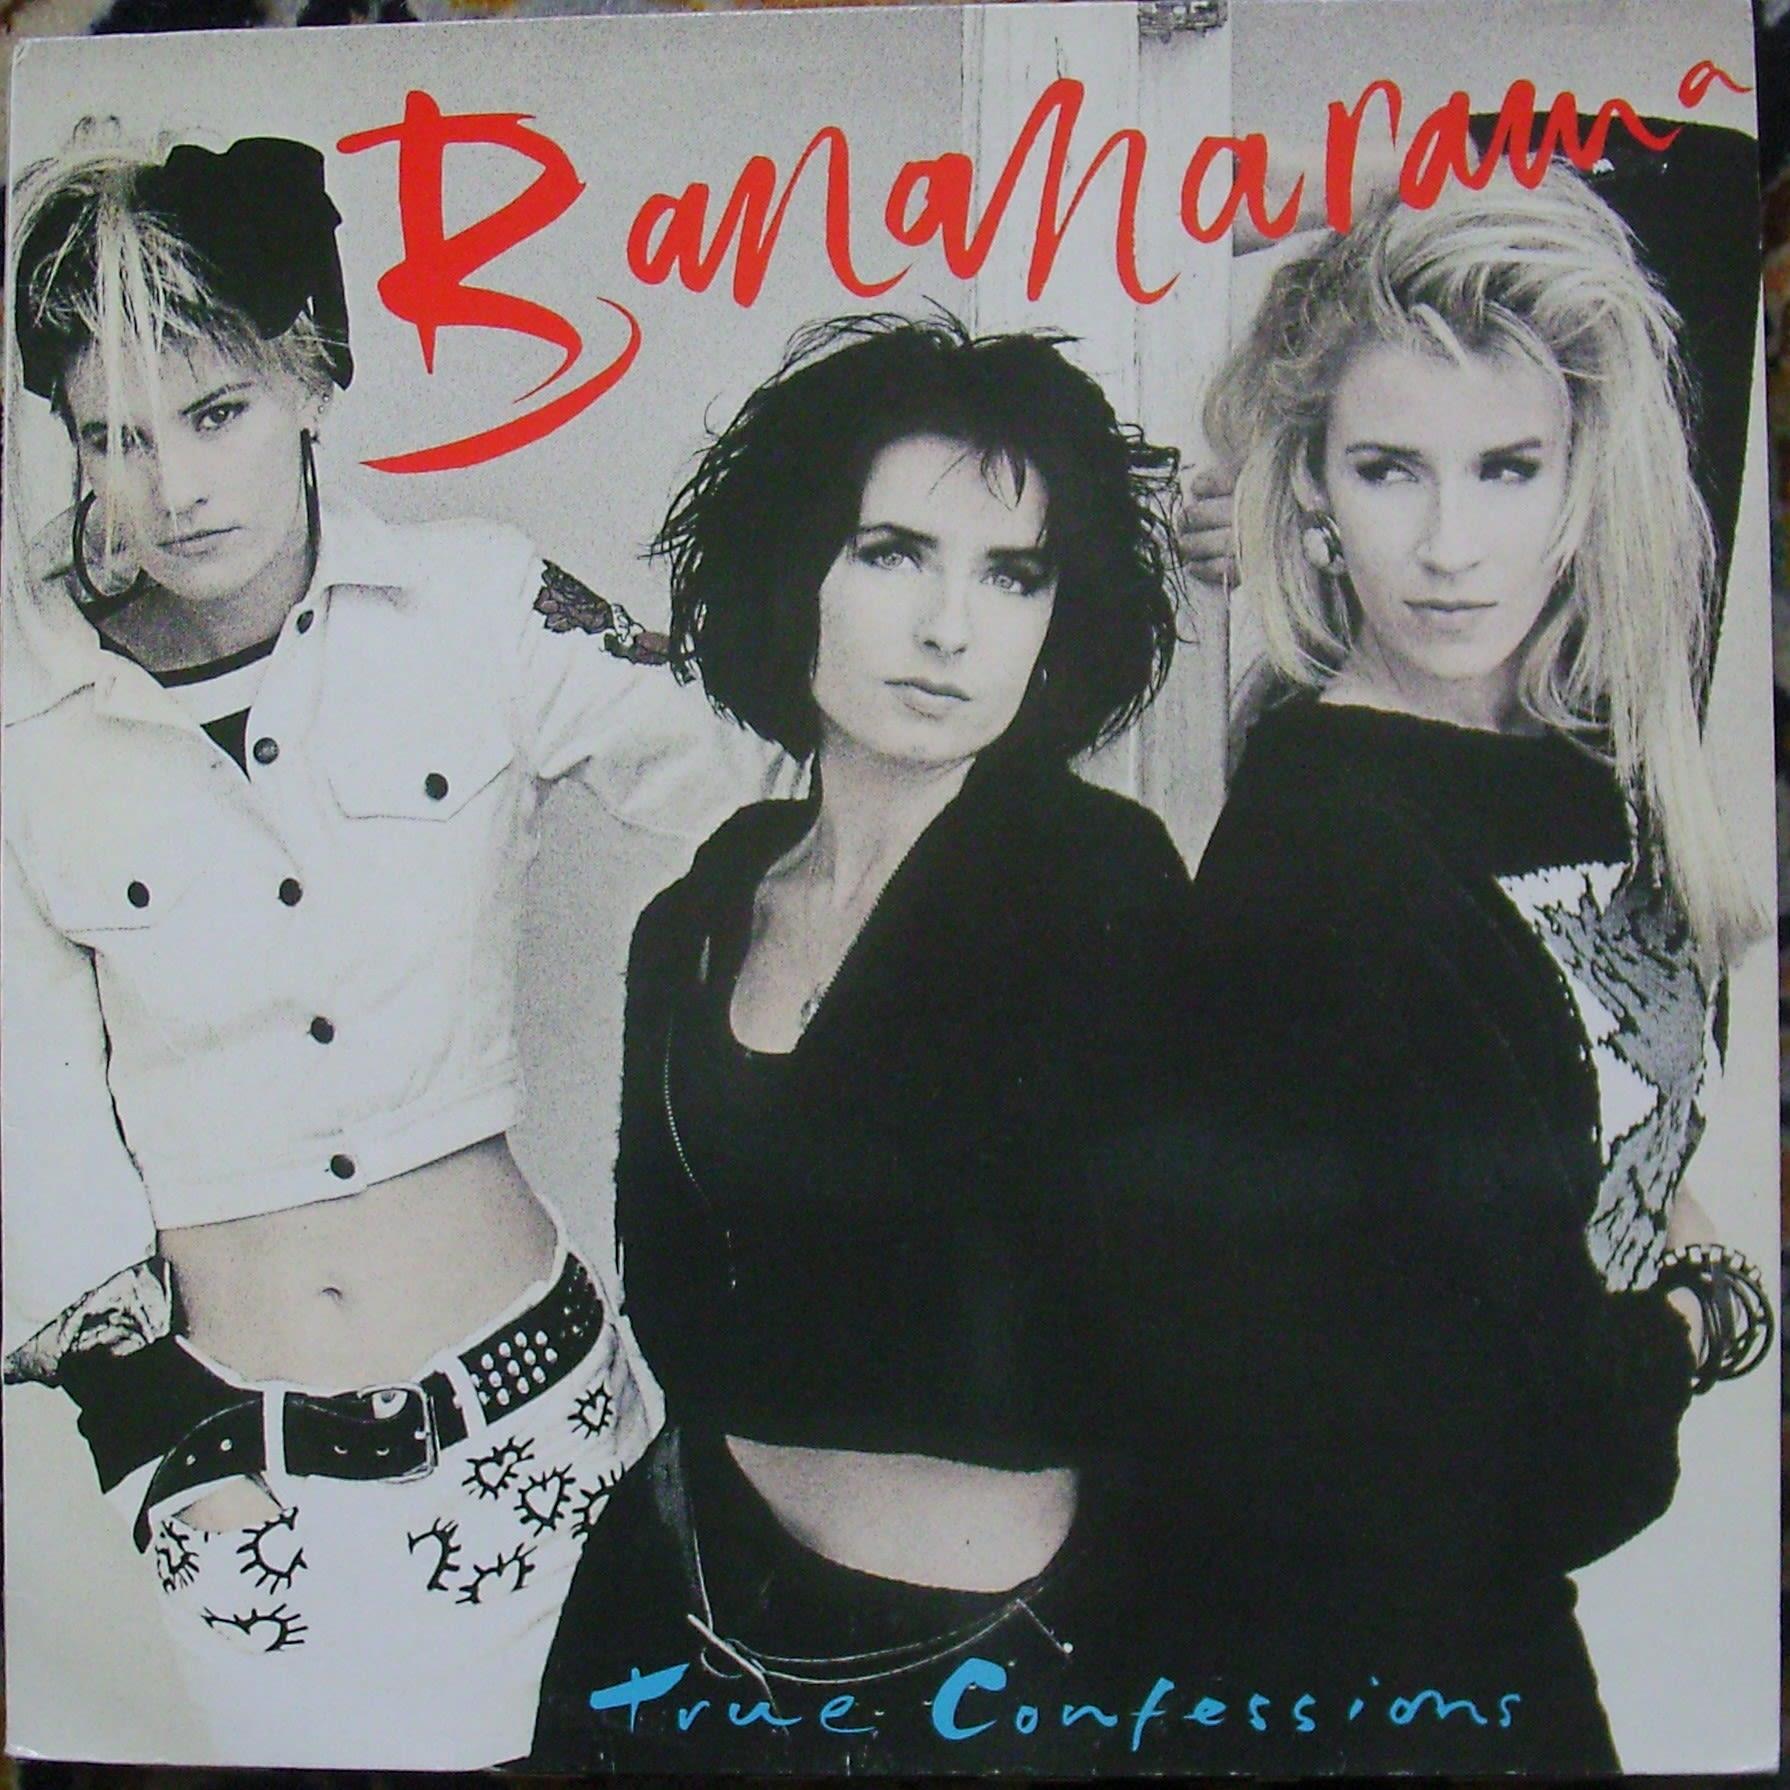 Bananarama True Confessions LP undefined